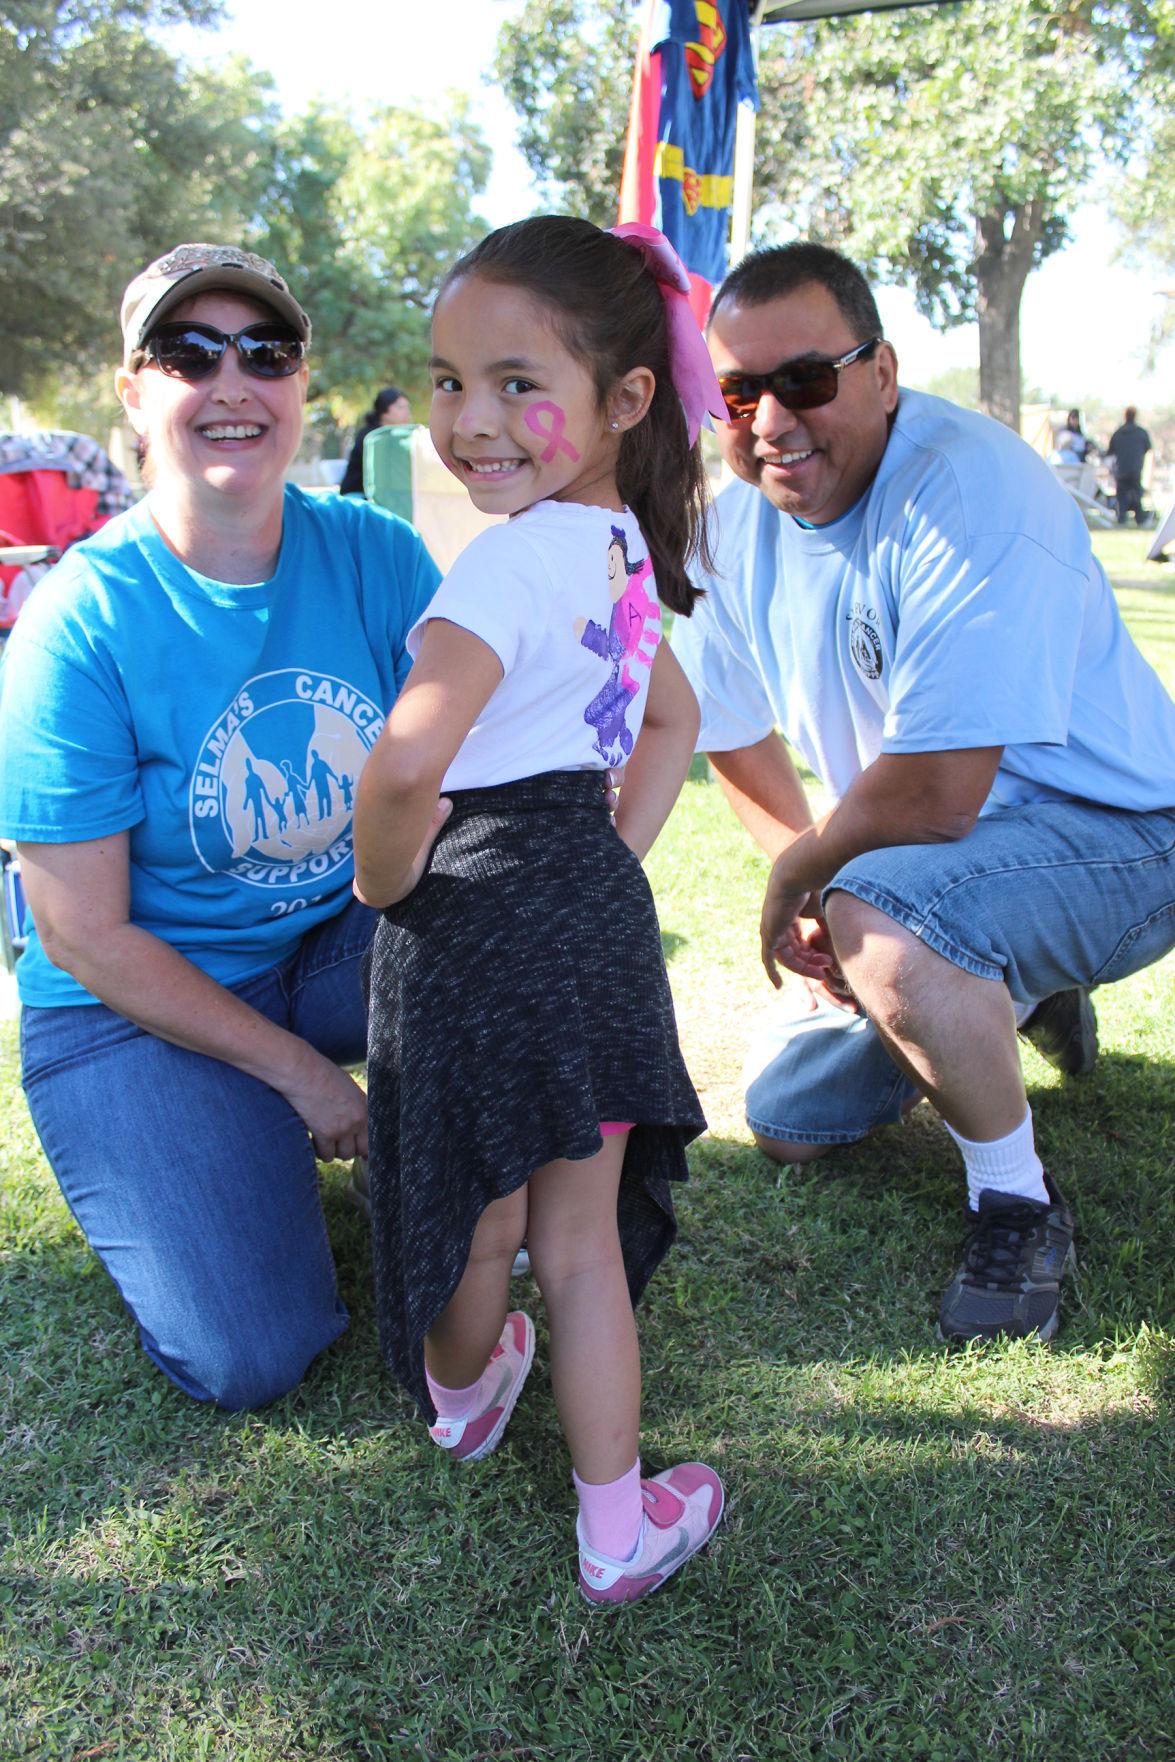 Central Valley Cancer Walk: Organizers